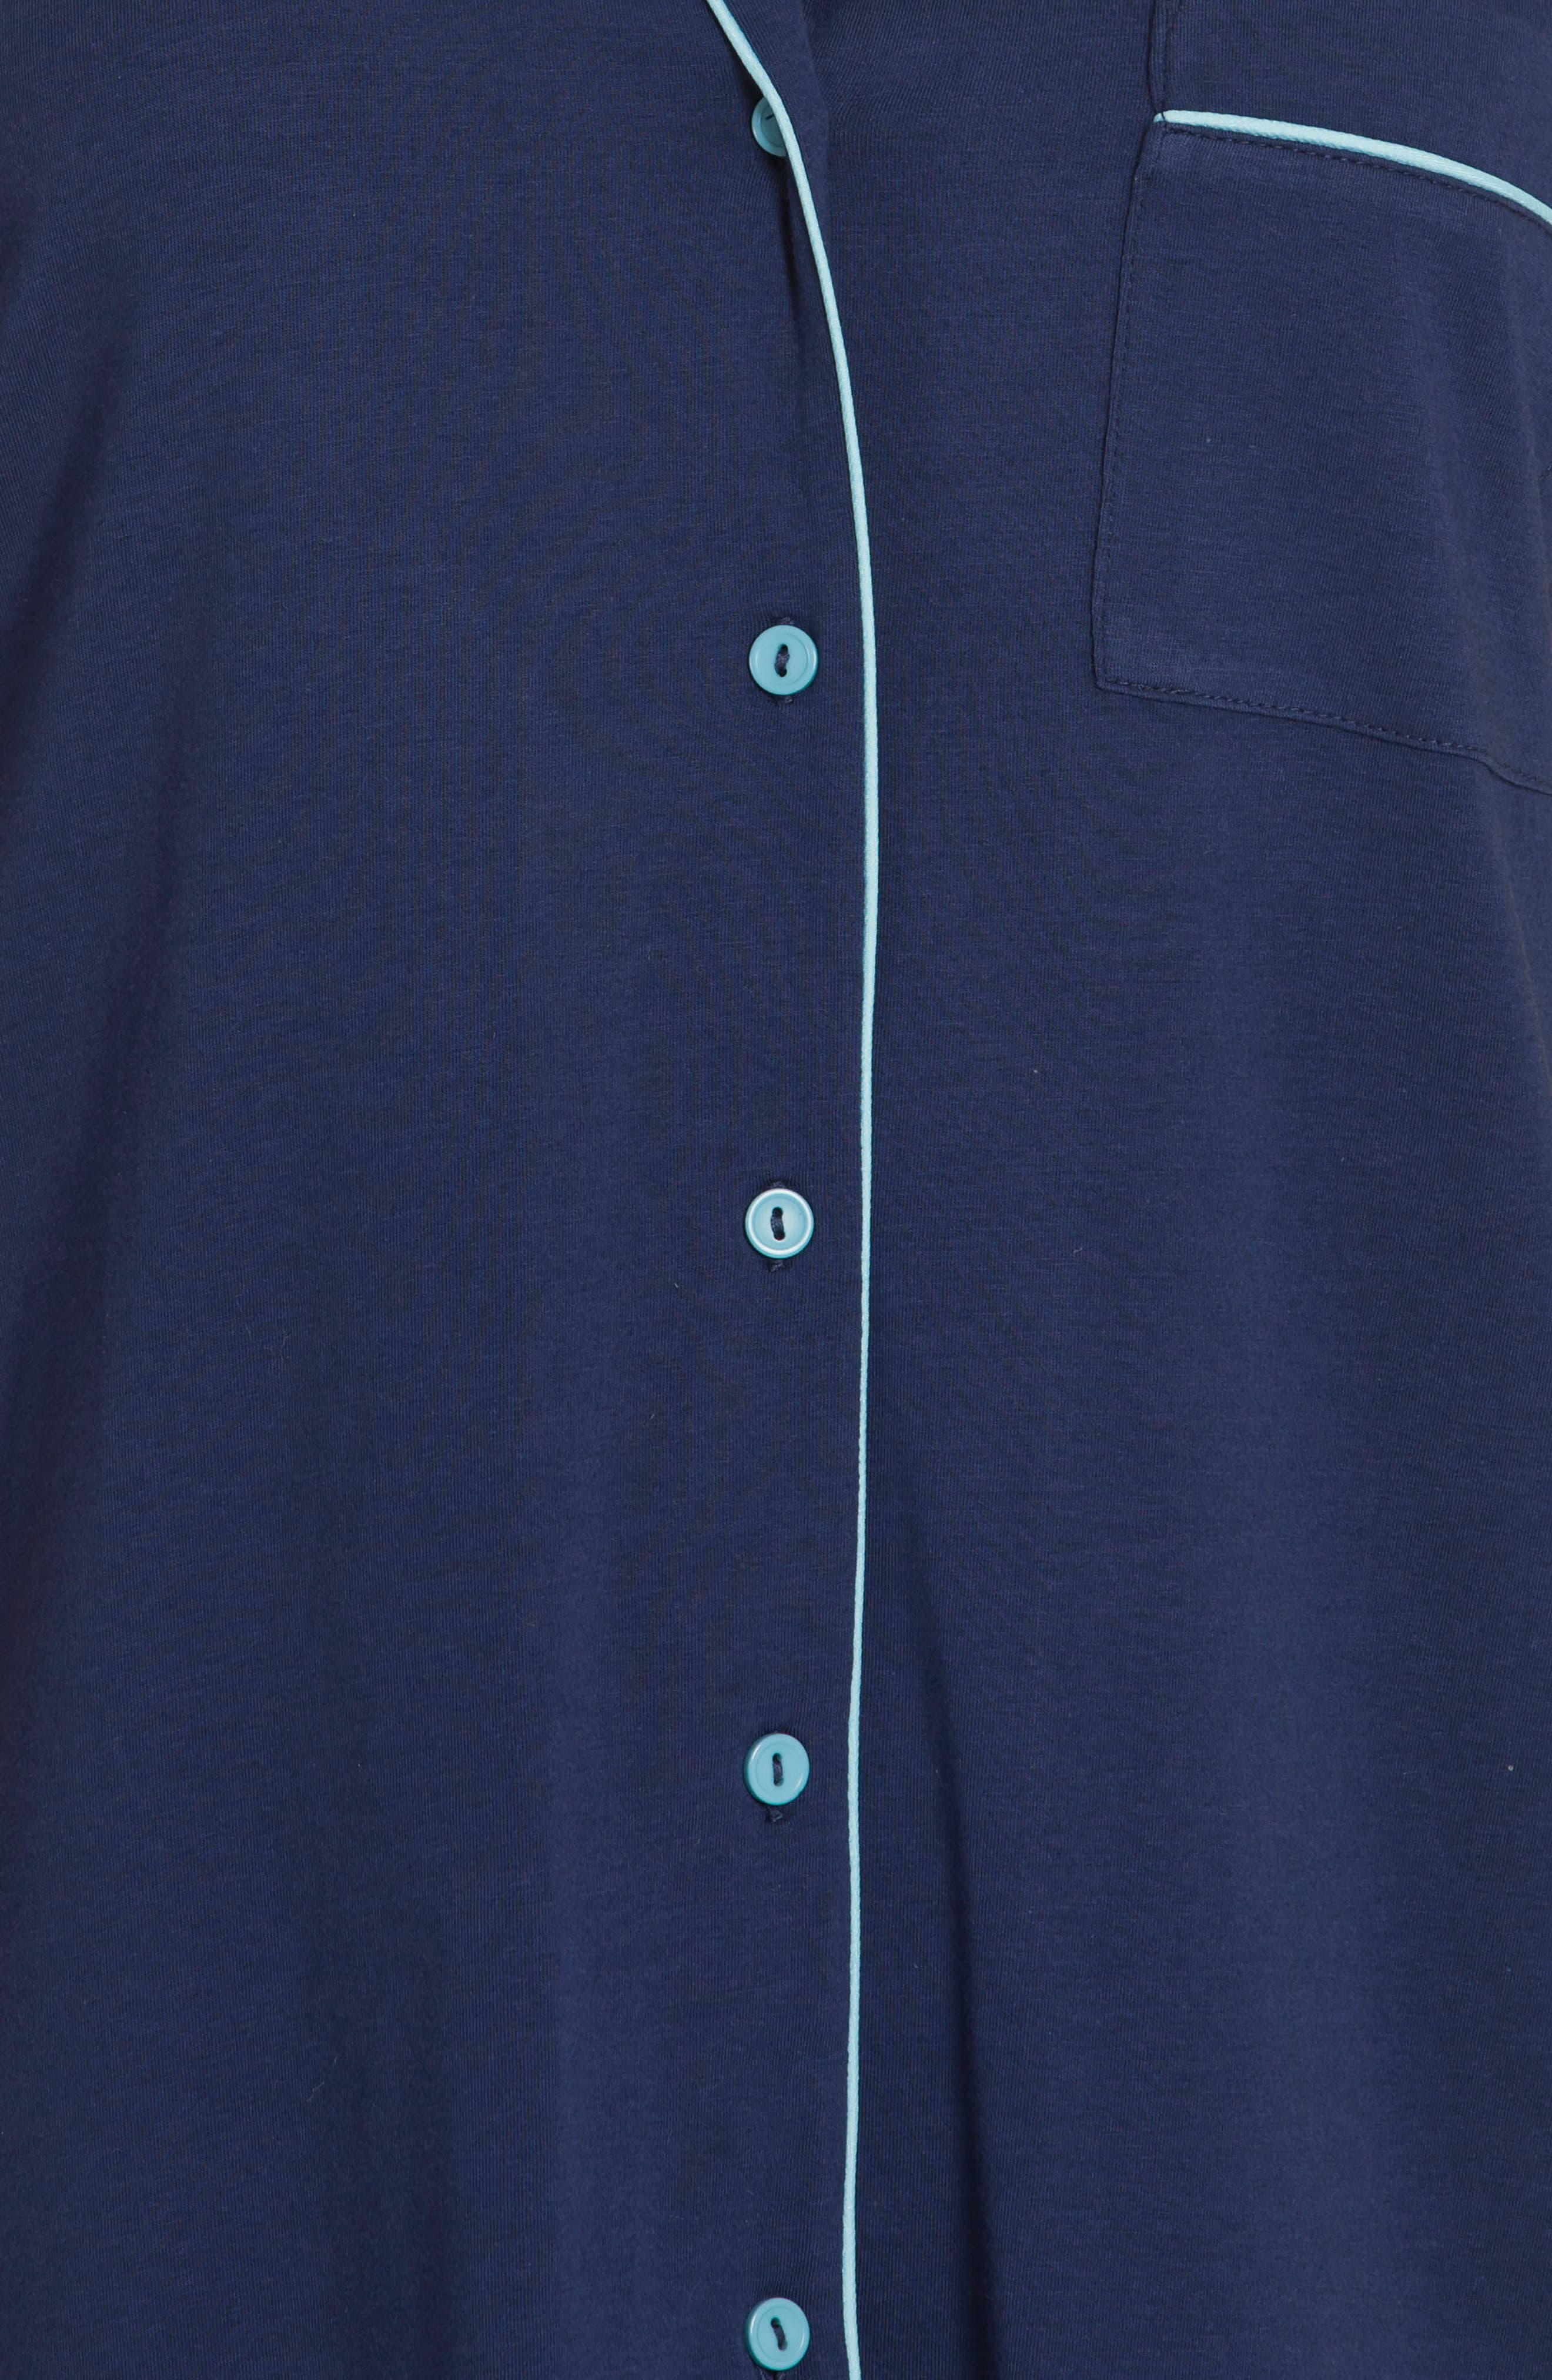 Sleep Shirt,                             Alternate thumbnail 4, color,                             480